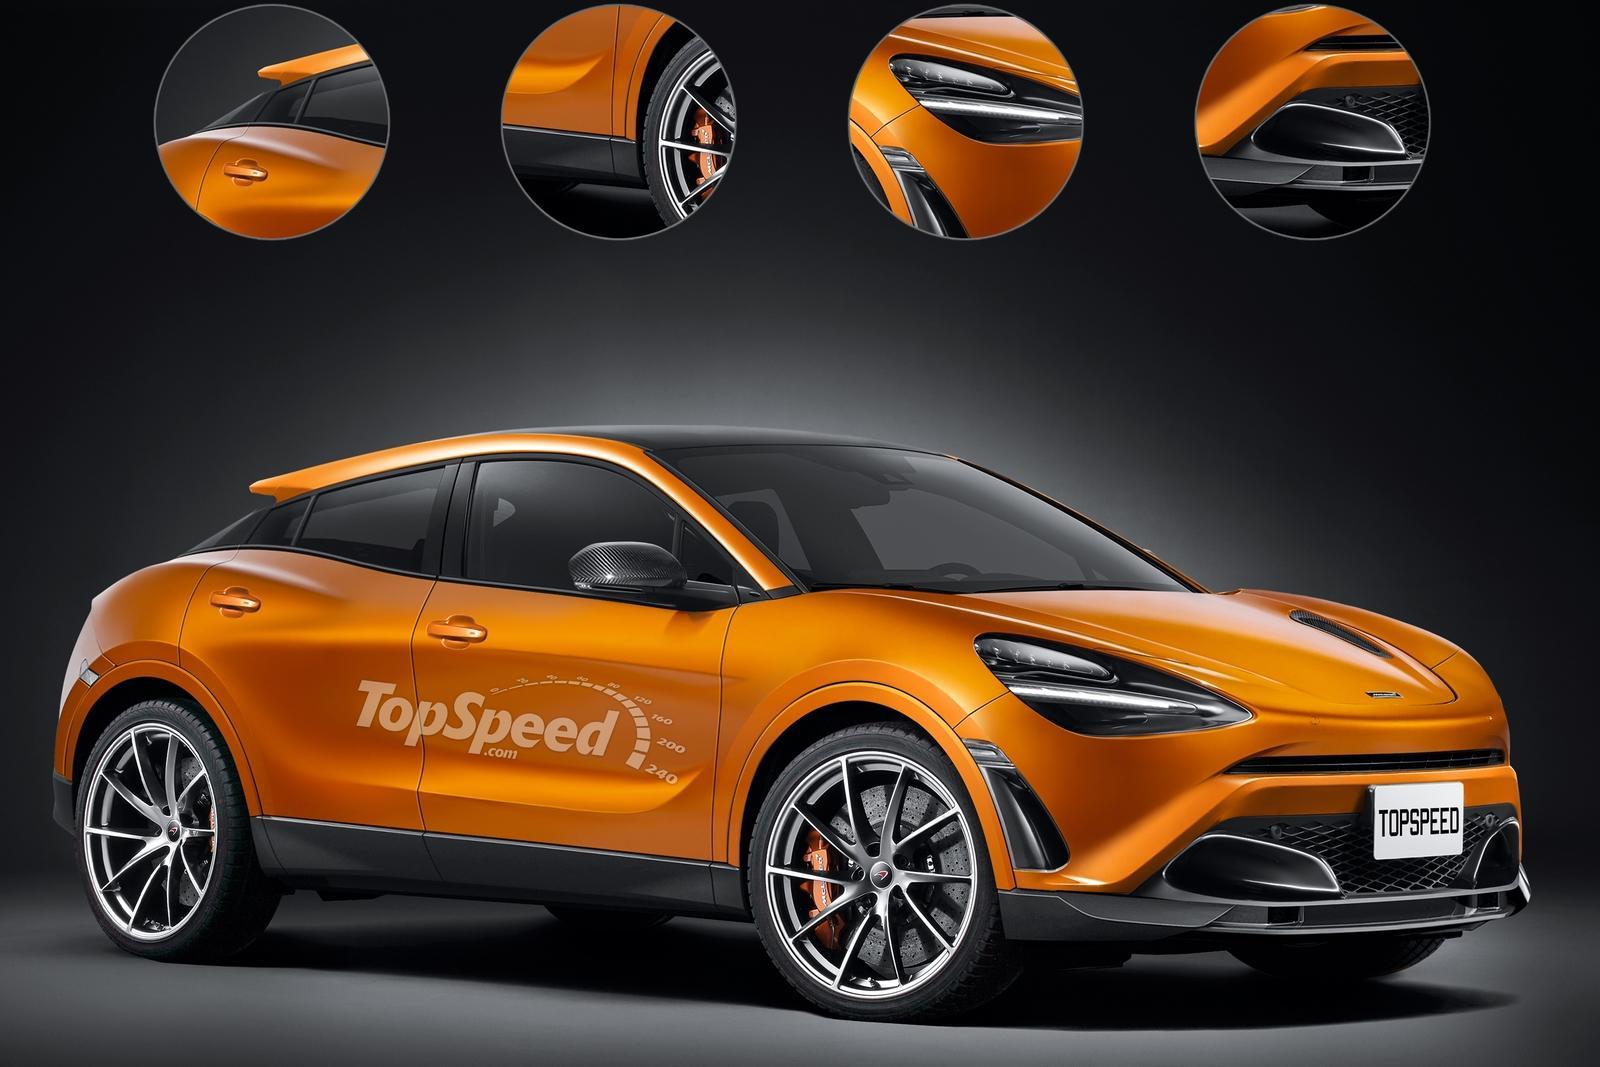 2020 McLaren SUV1